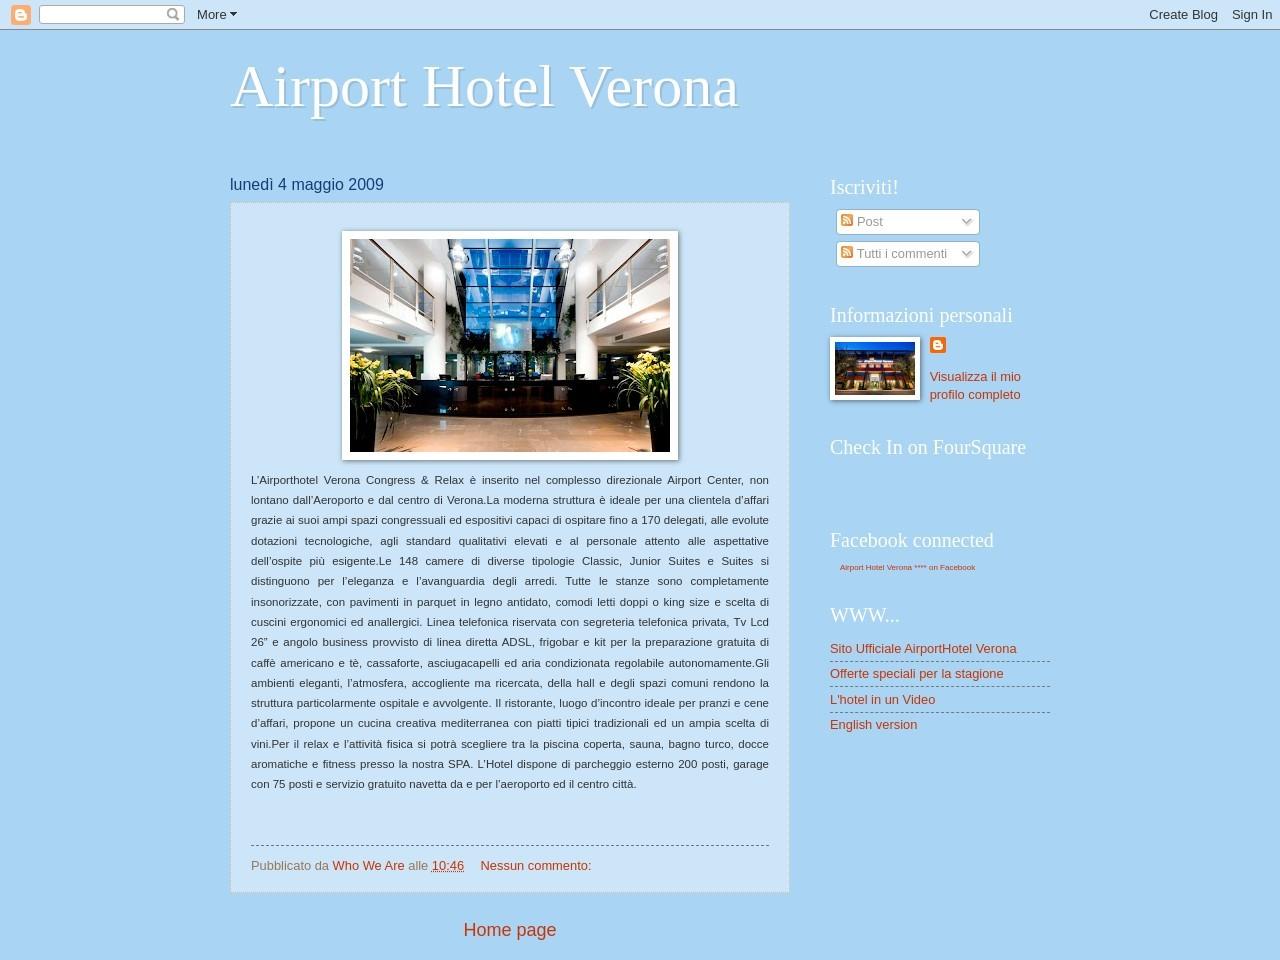 hotel-verona-airport